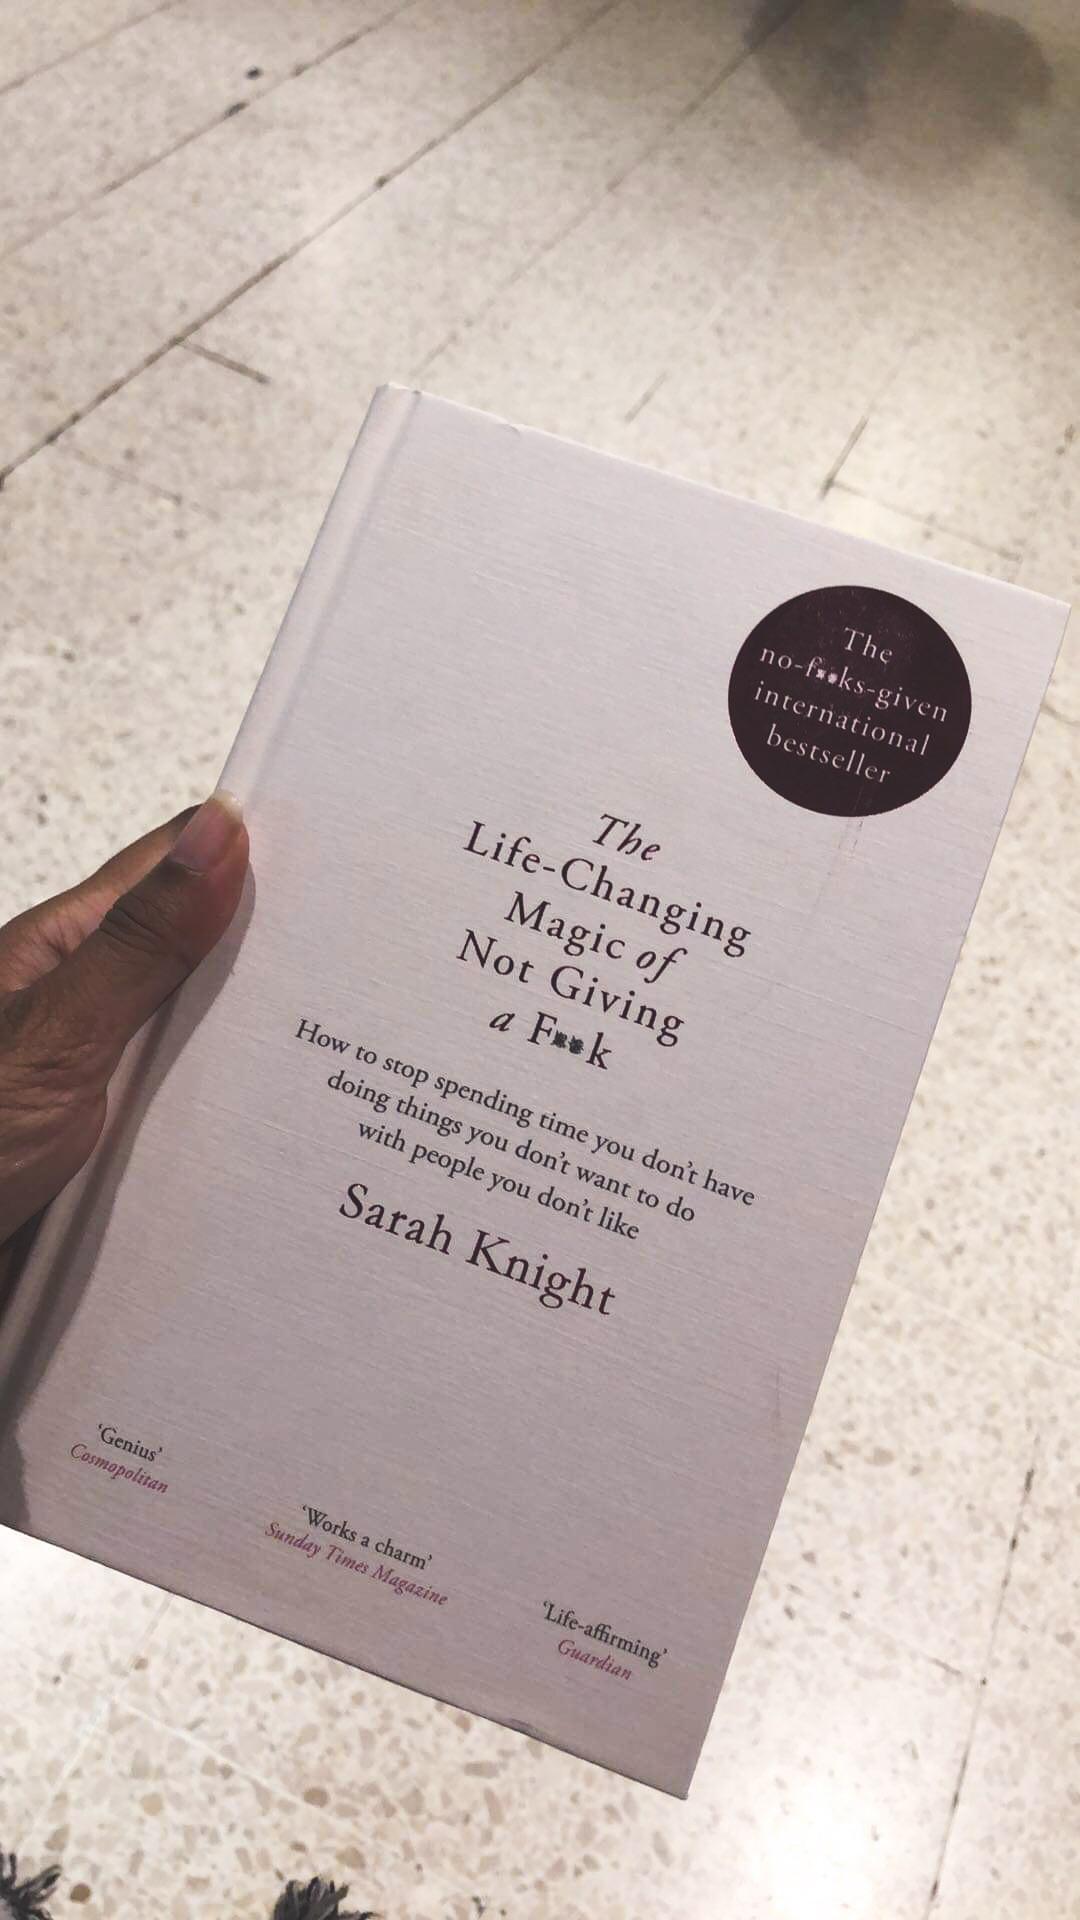 Self-help books to keep me going!